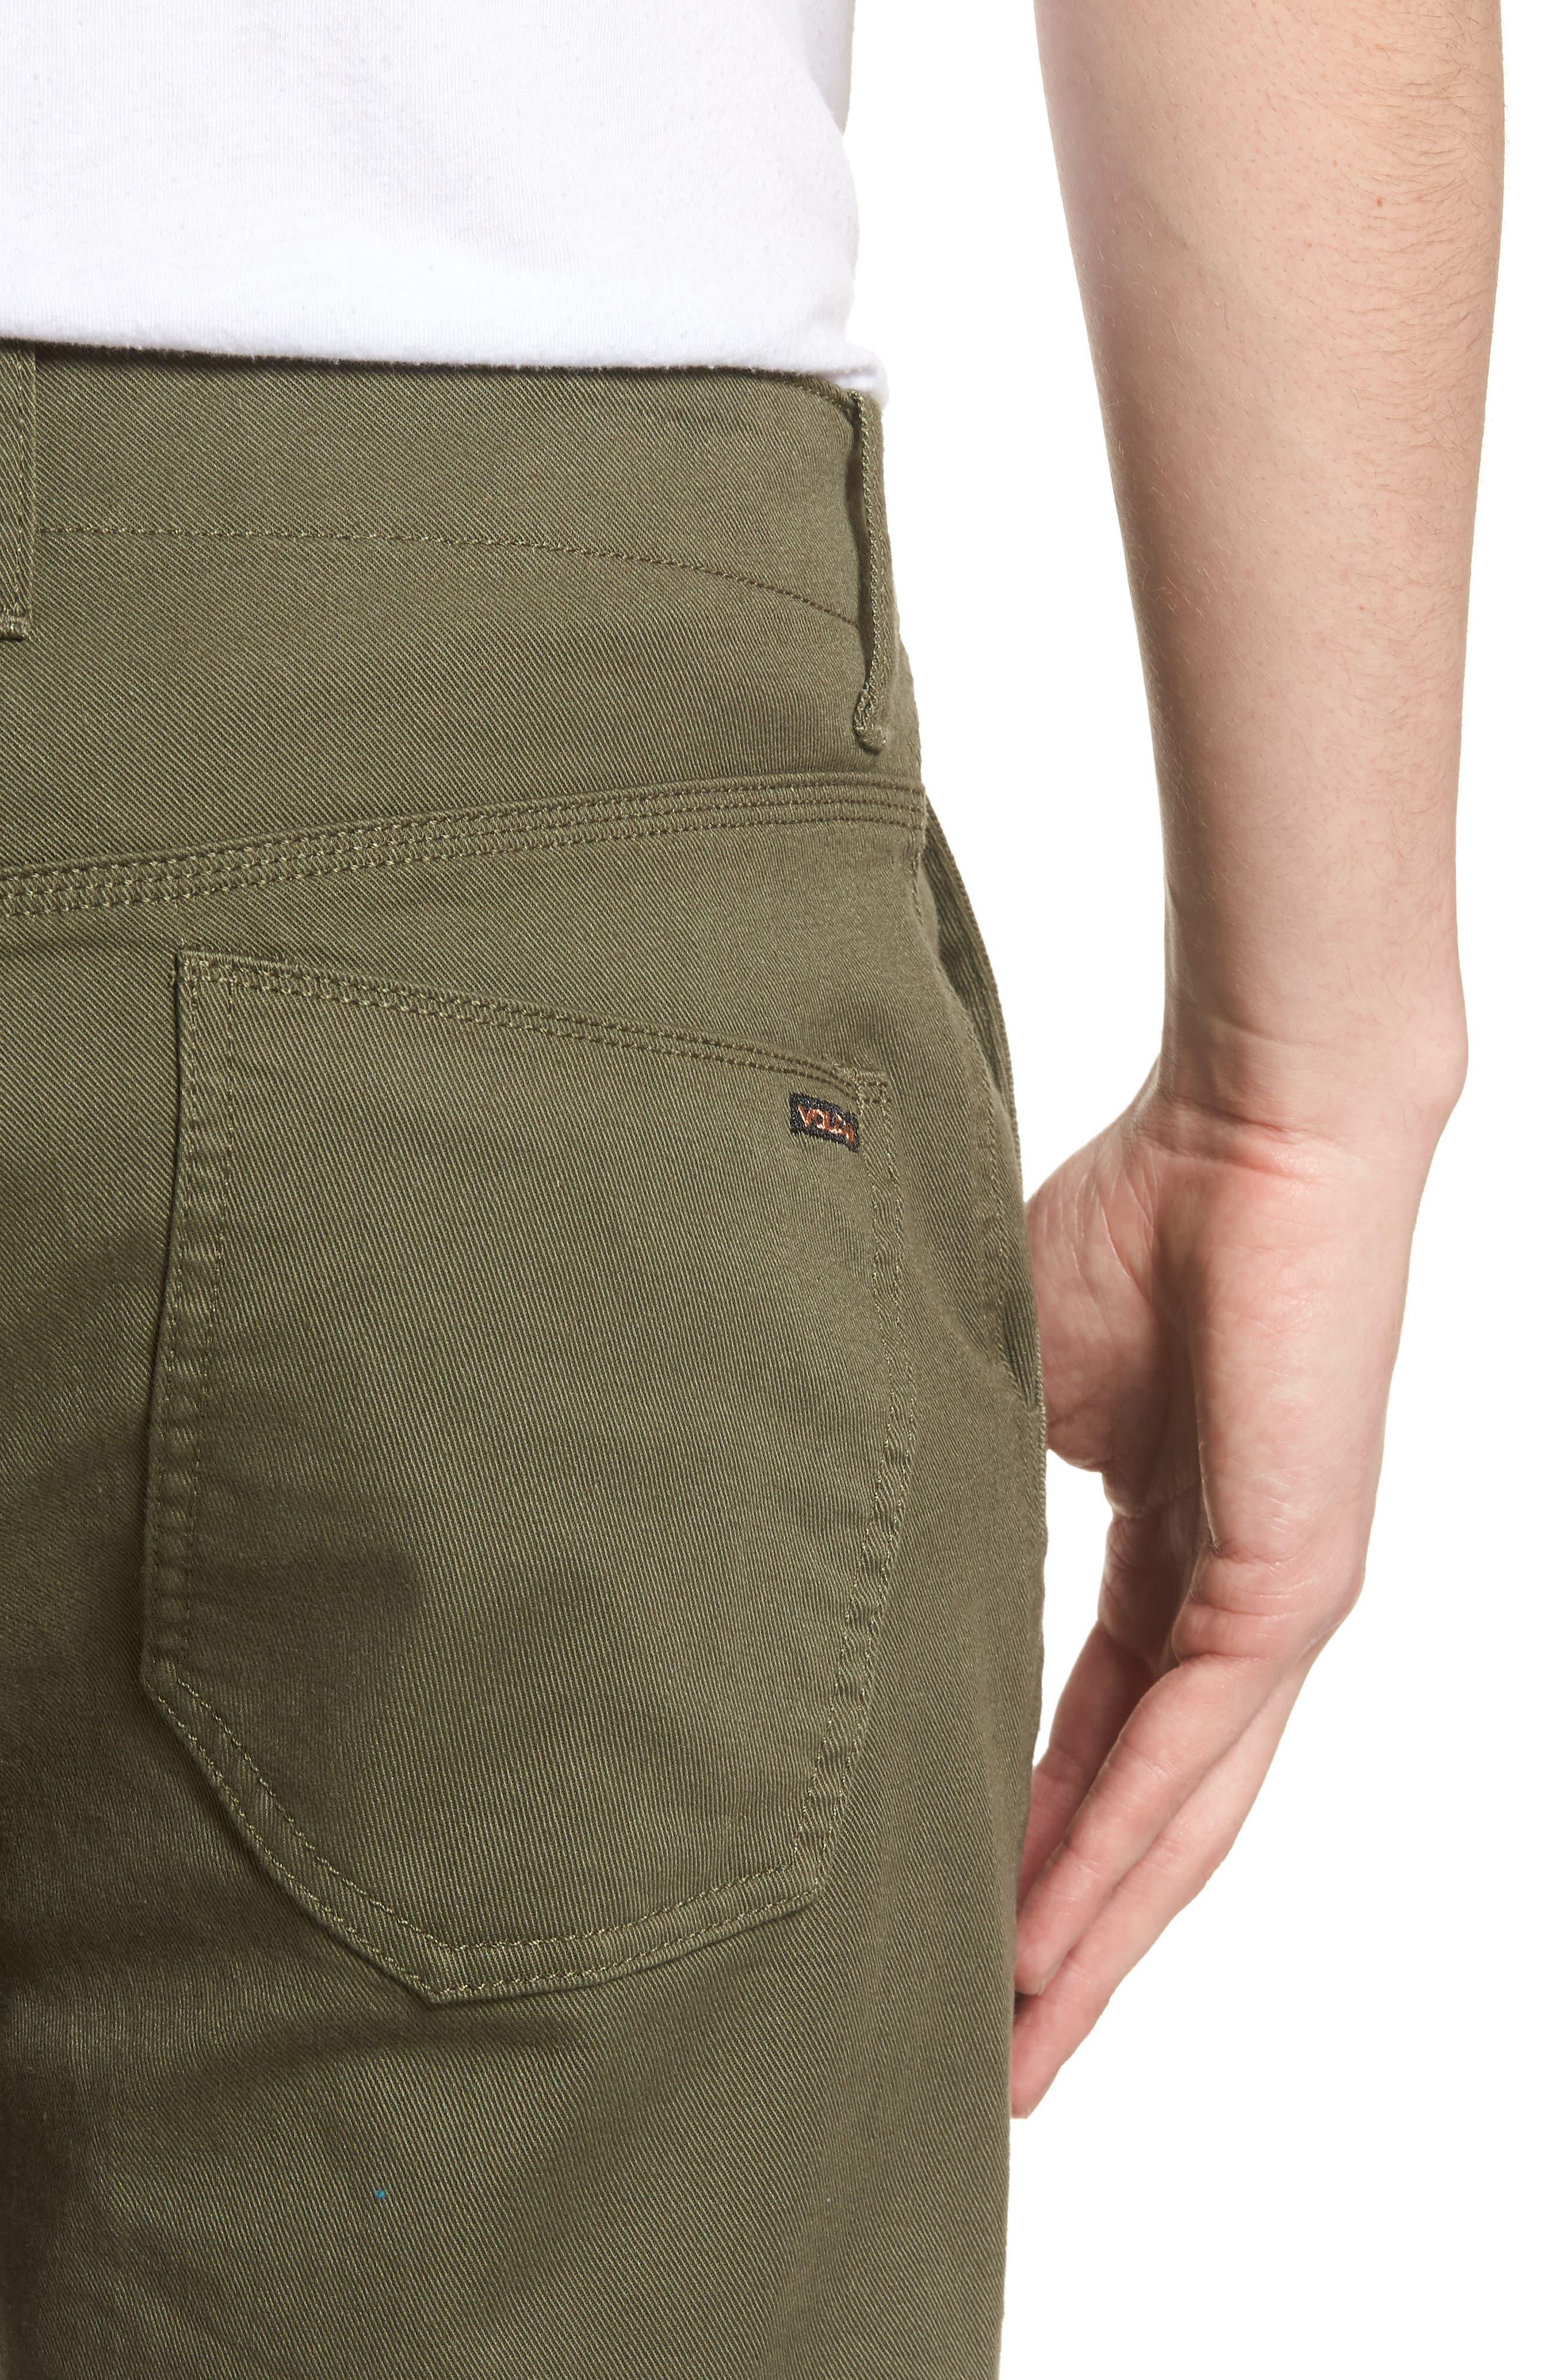 VSM Prowler Shorts,                             Alternate thumbnail 12, color,